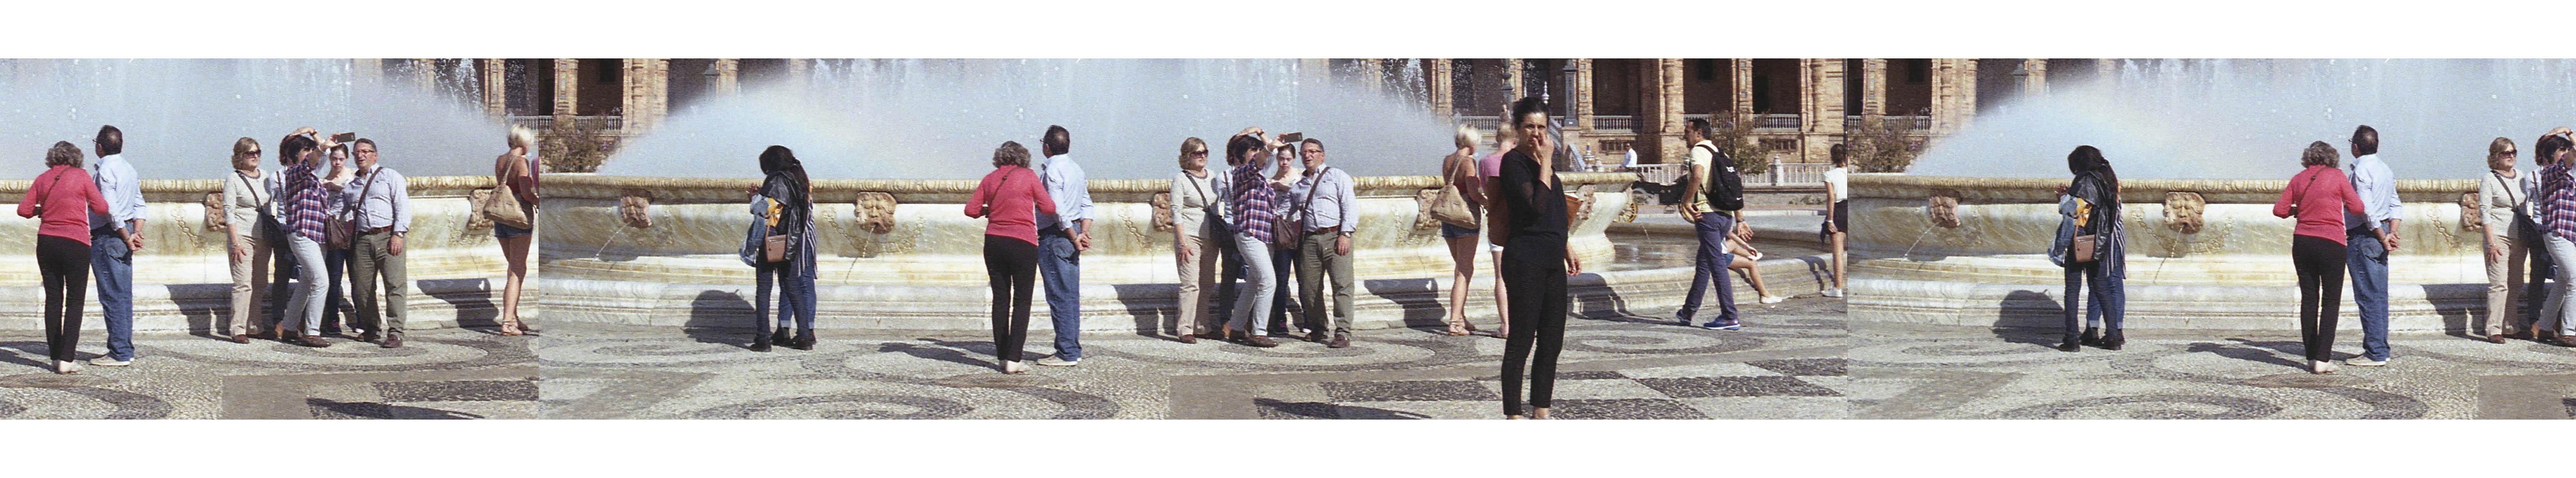 08- turistas gilli